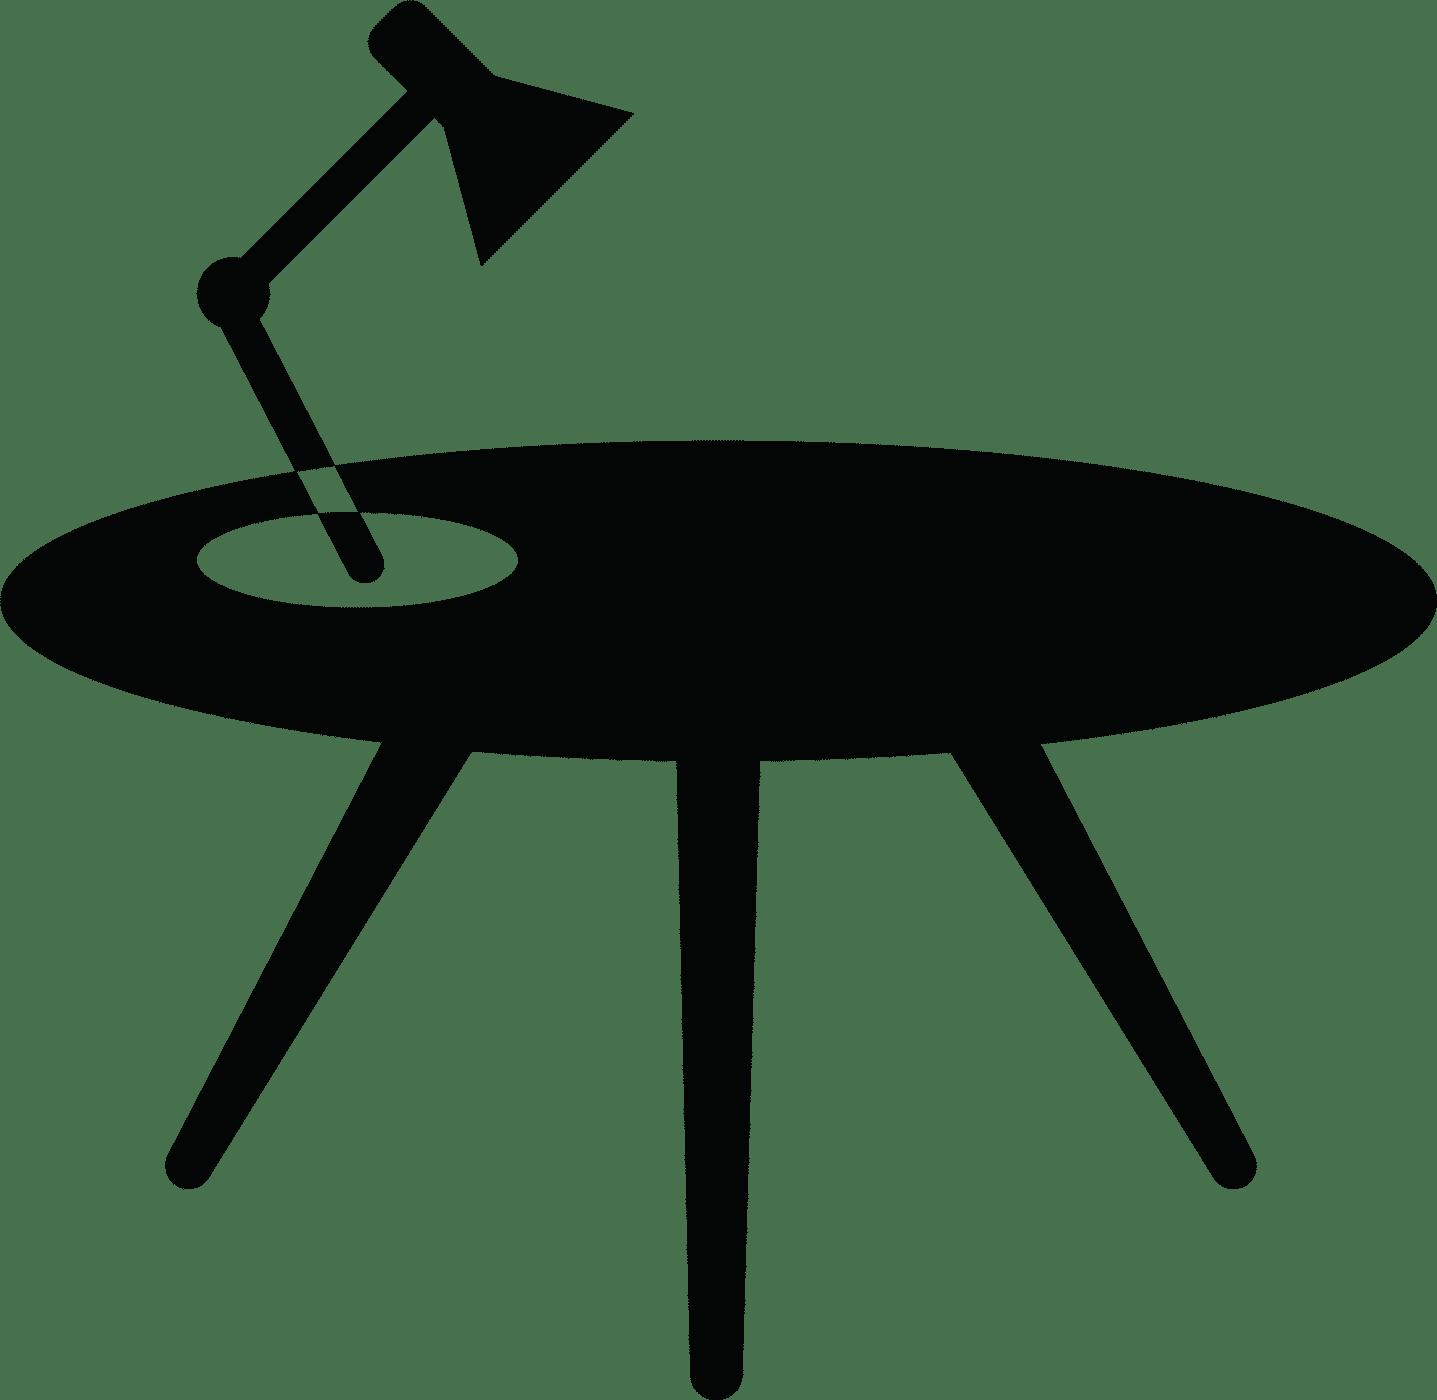 HIGH TABLE